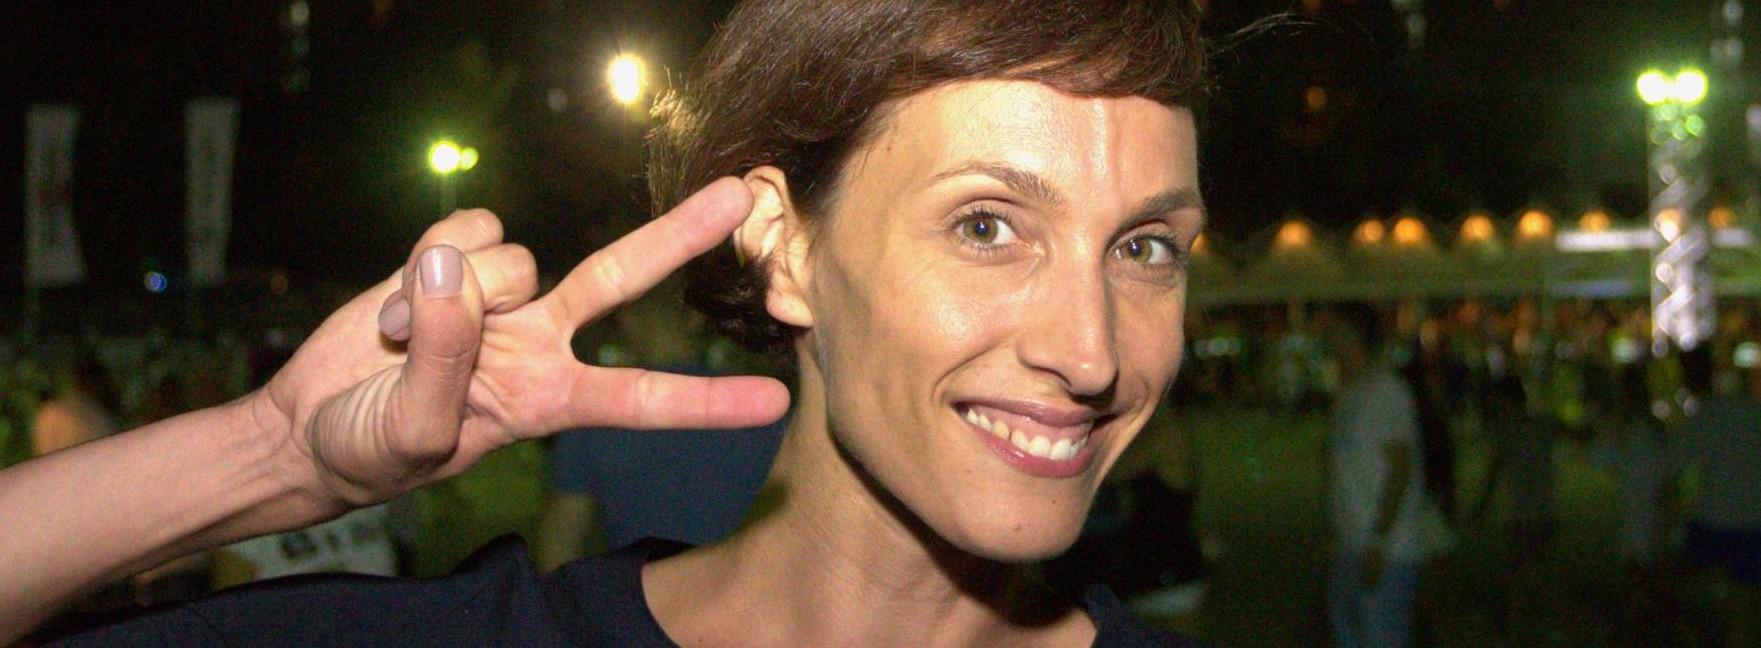 GORAN NAVOJEC I LARISA LIPOVAC:  'Braku je presudila razdvojenost'